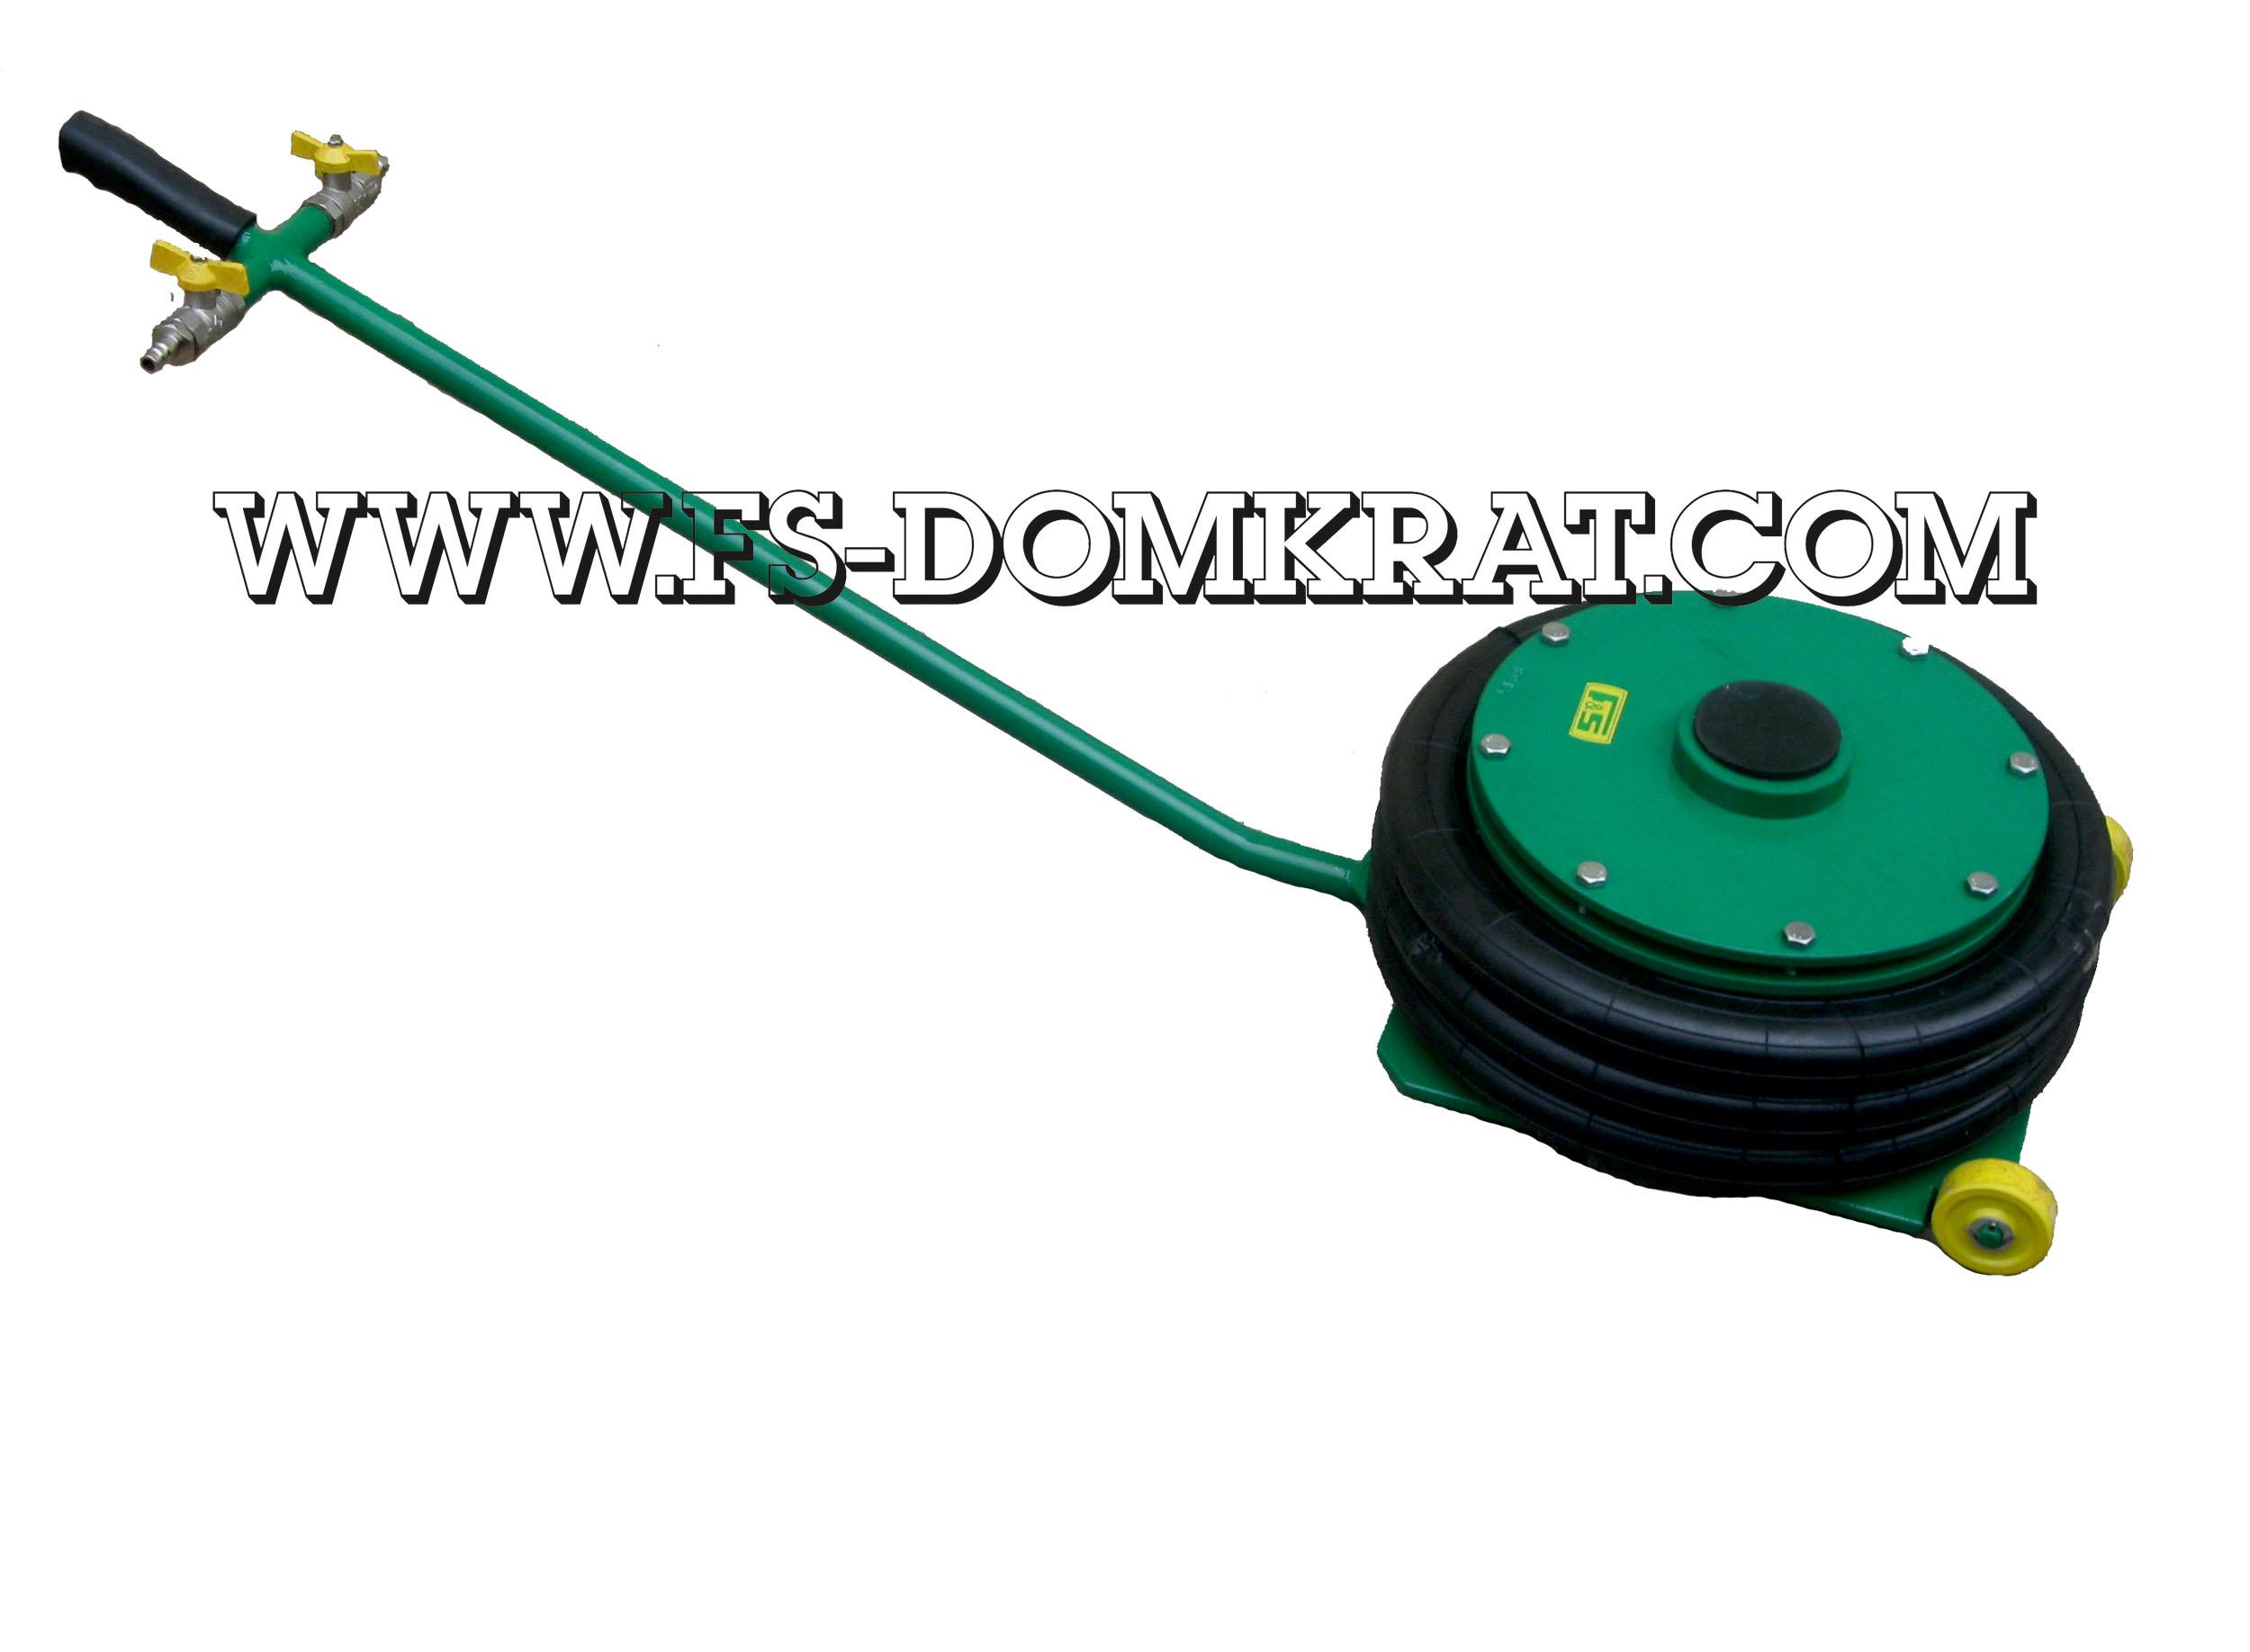 Домкрат пневматичний ДП-3, фото 1